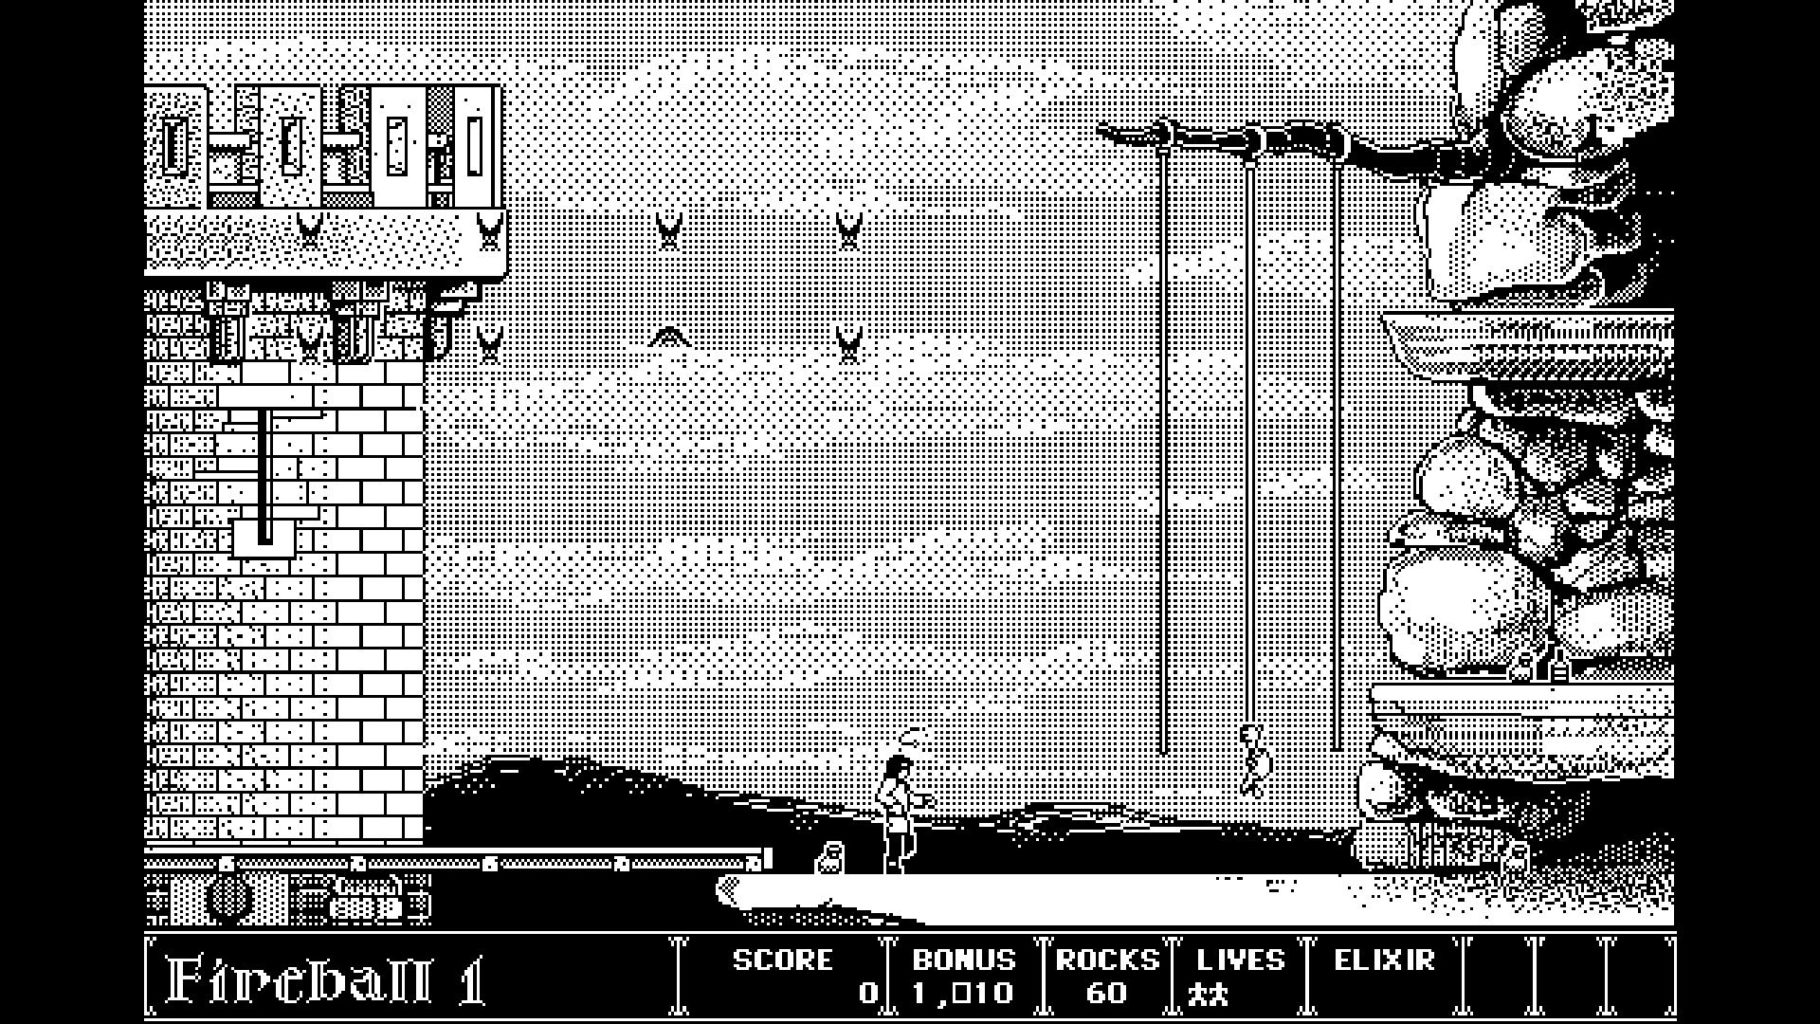 Figure 2: Machintosh 上的知名游戏,Dark Castle,画面只有两种颜色